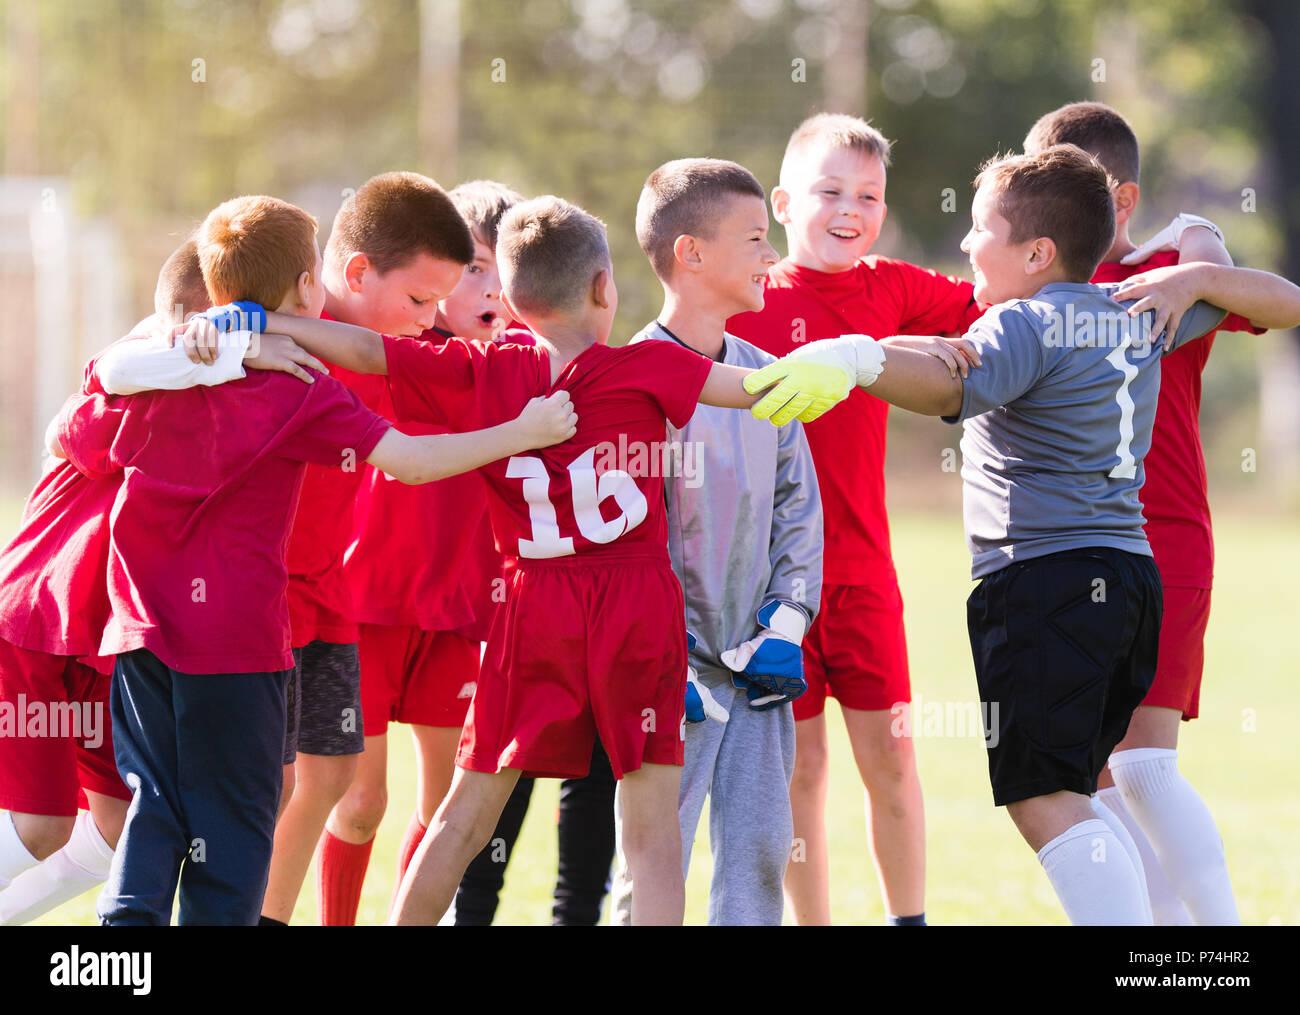 Kinder Fussball Fussball Jungen Kindern Spieler Feiern In